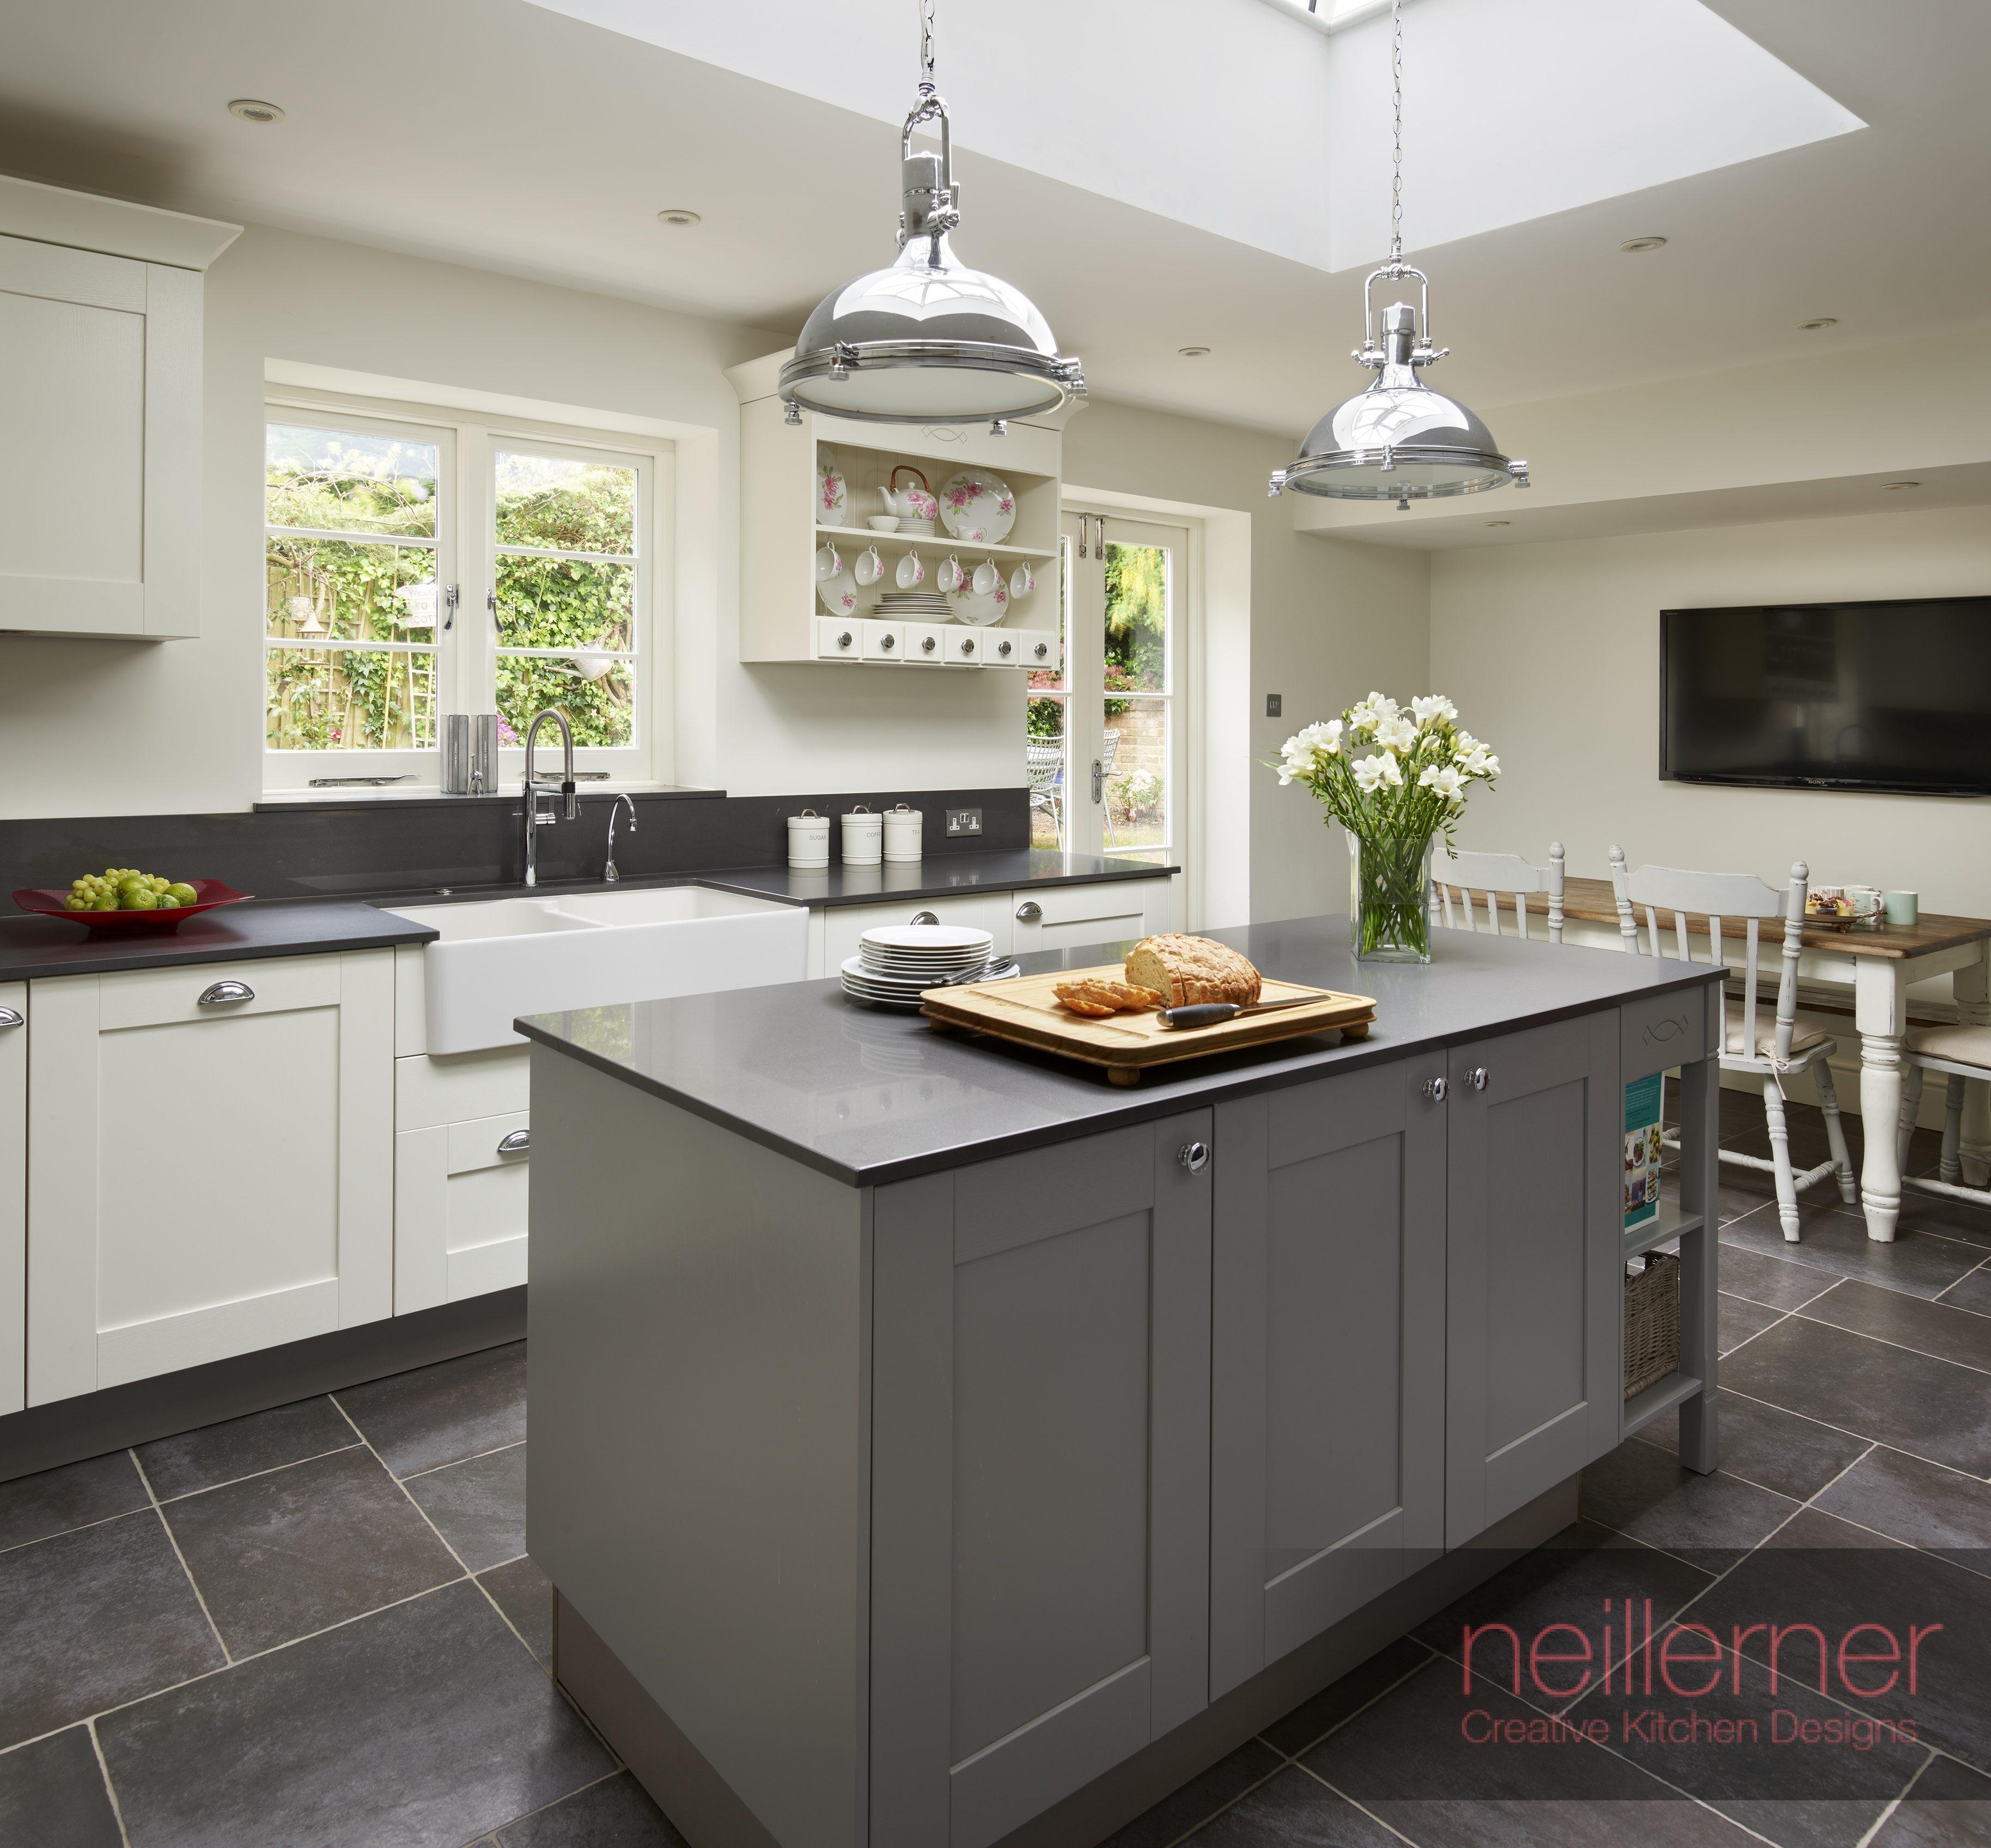 Neil Lerner Kitchen Design